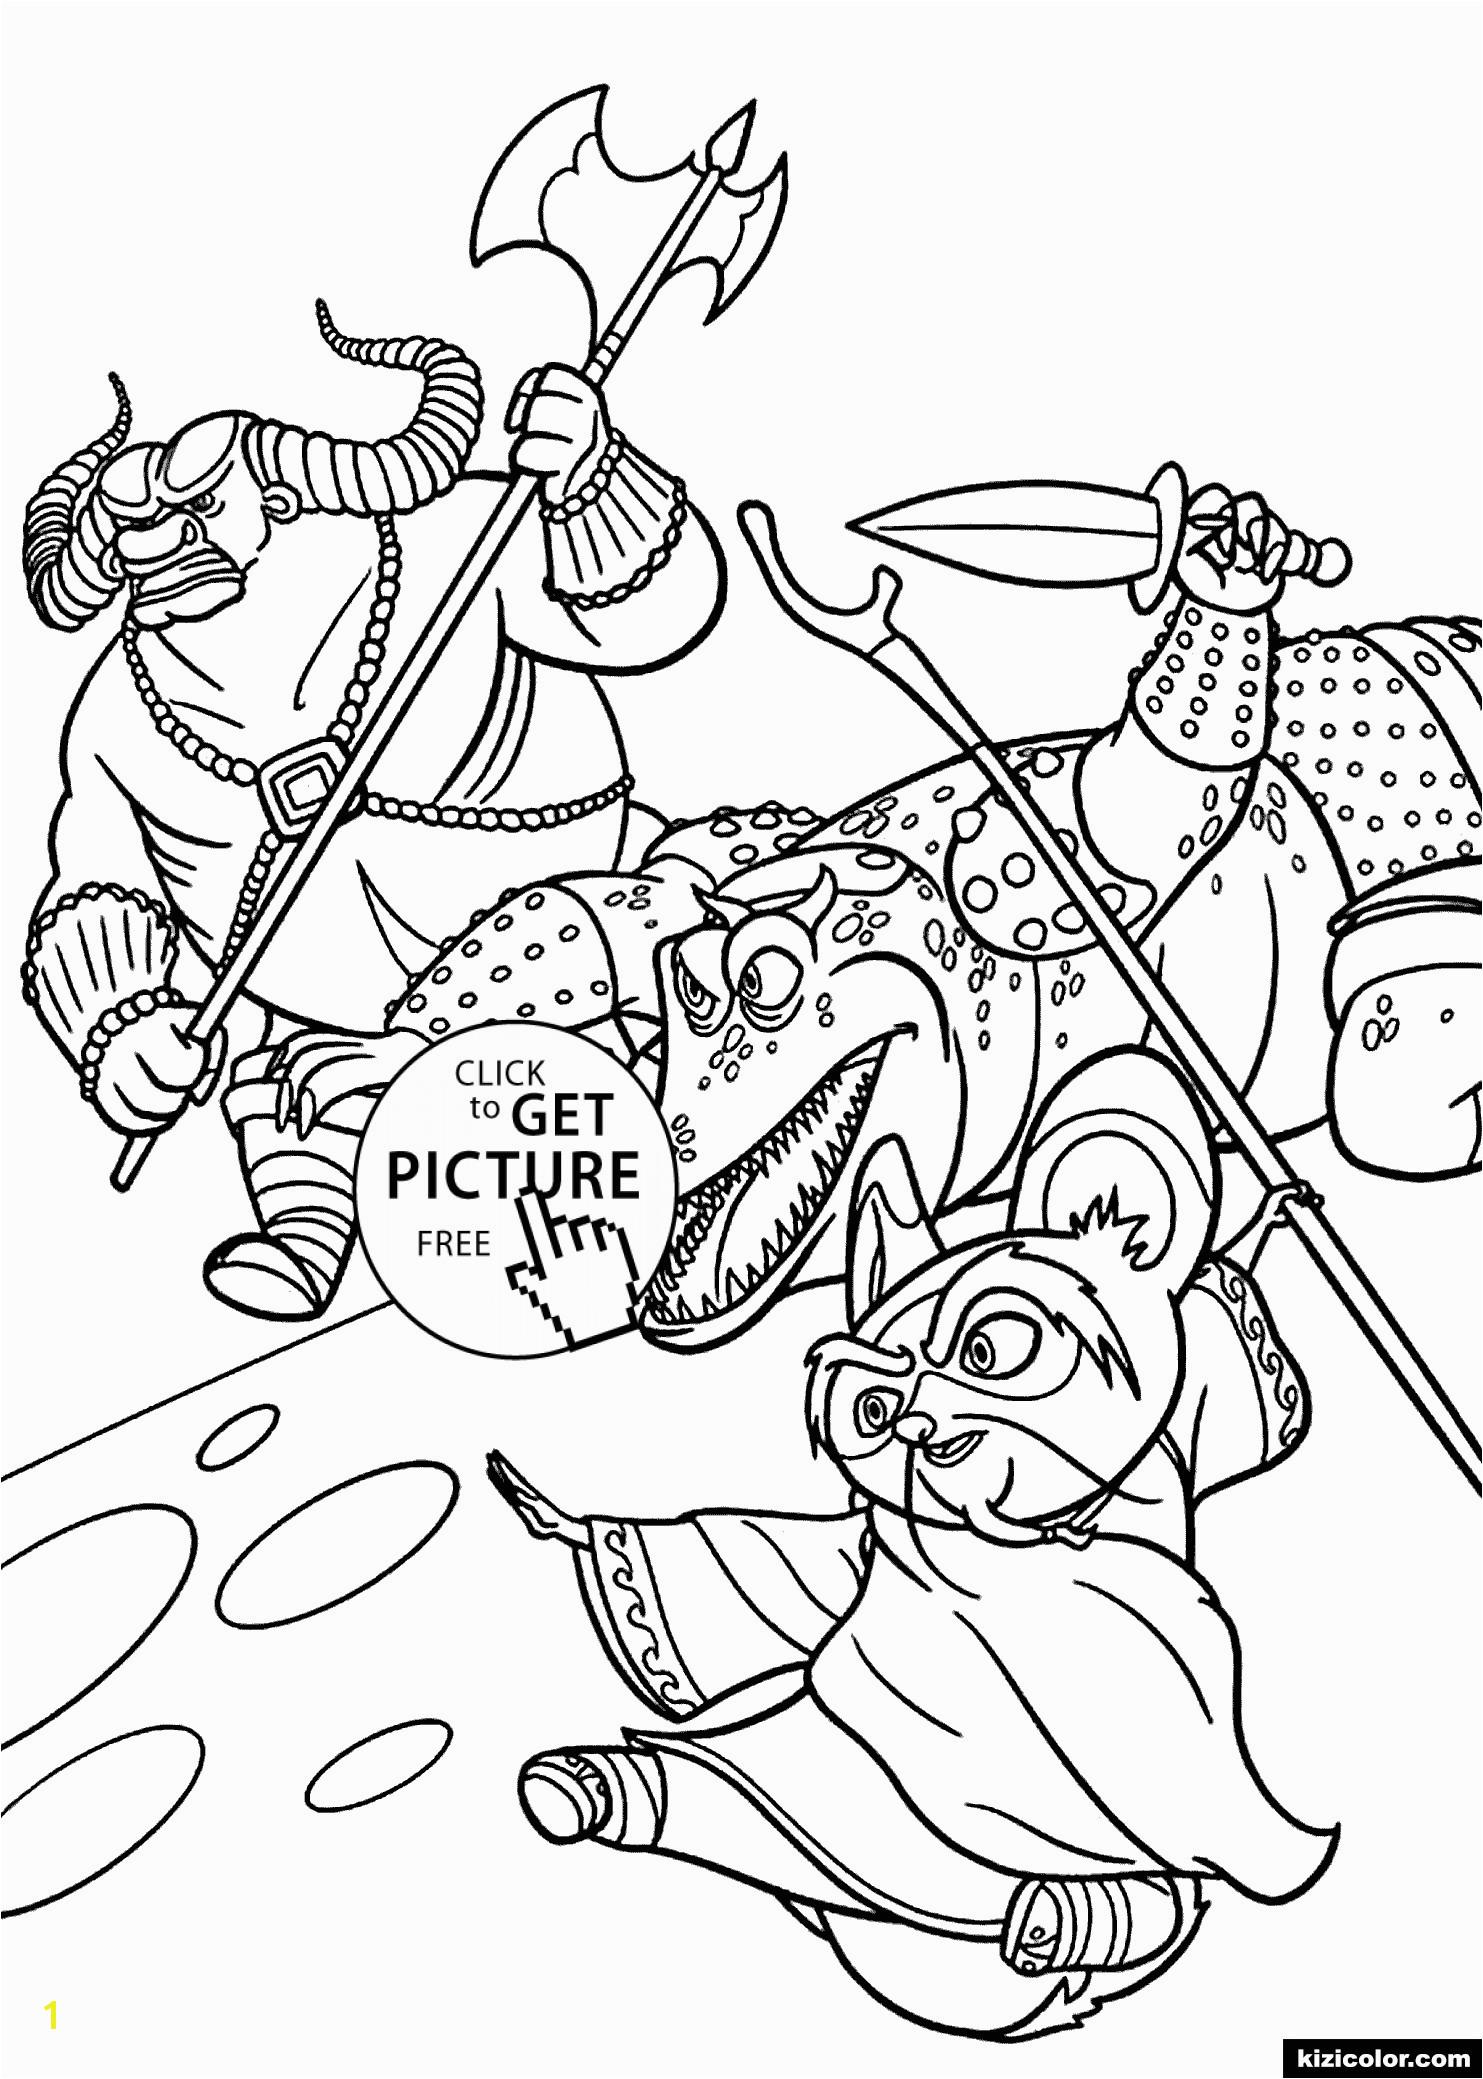 Bratz Ice Skating Coloring Pages Kung Fu Panda Master Shifu Free Printable Coloring Pages for Kids